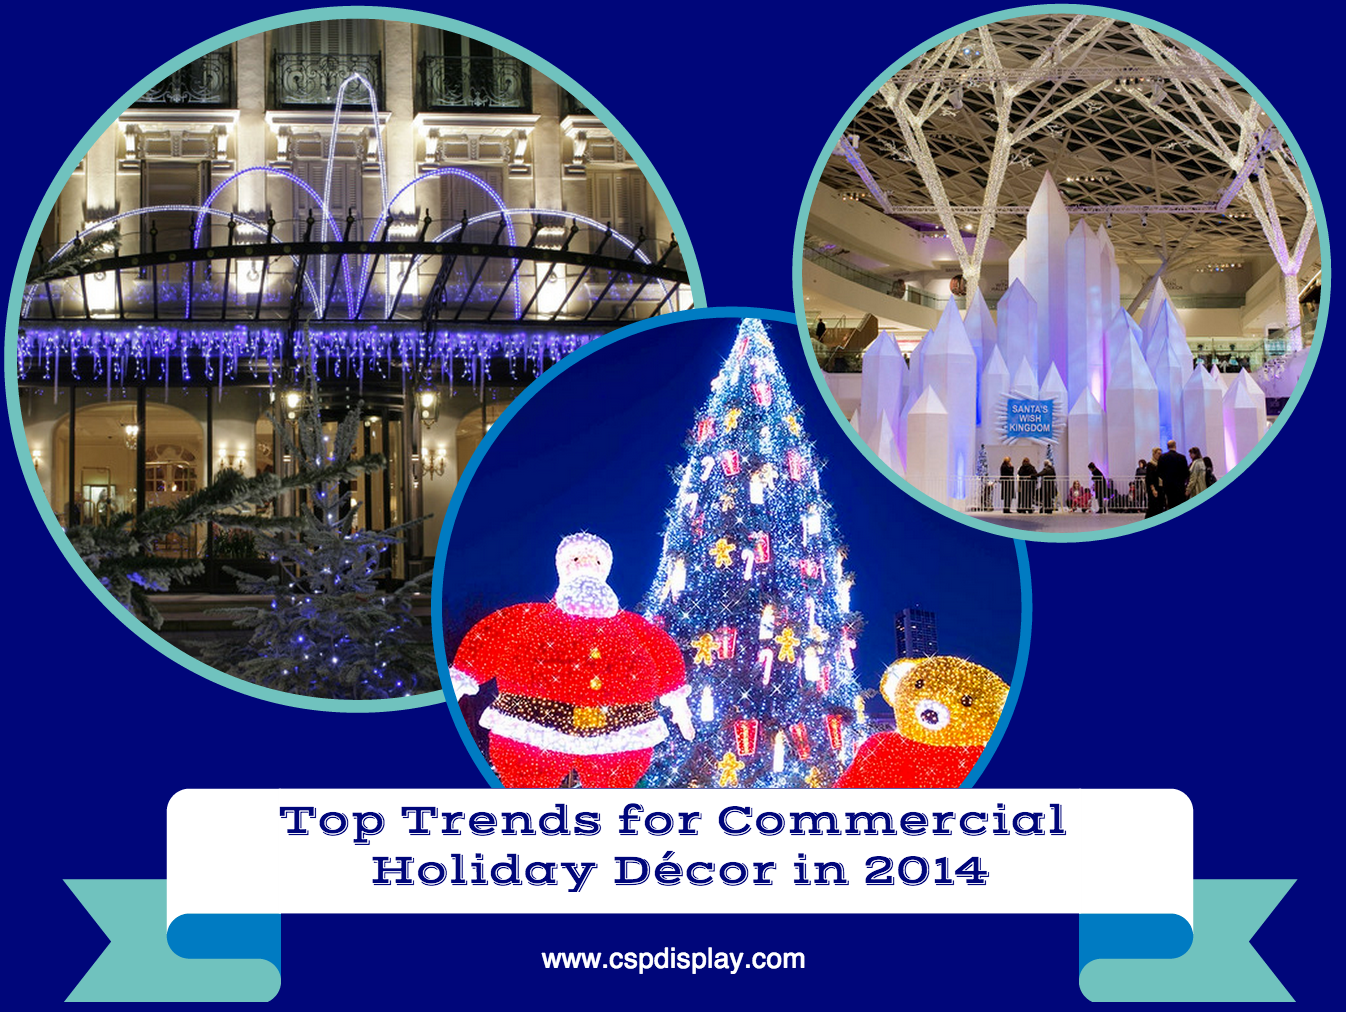 Top Trends for Commercial Decor in 2014 #holidaydecor #seasonaldecor #commercialdecor #cspdisplay